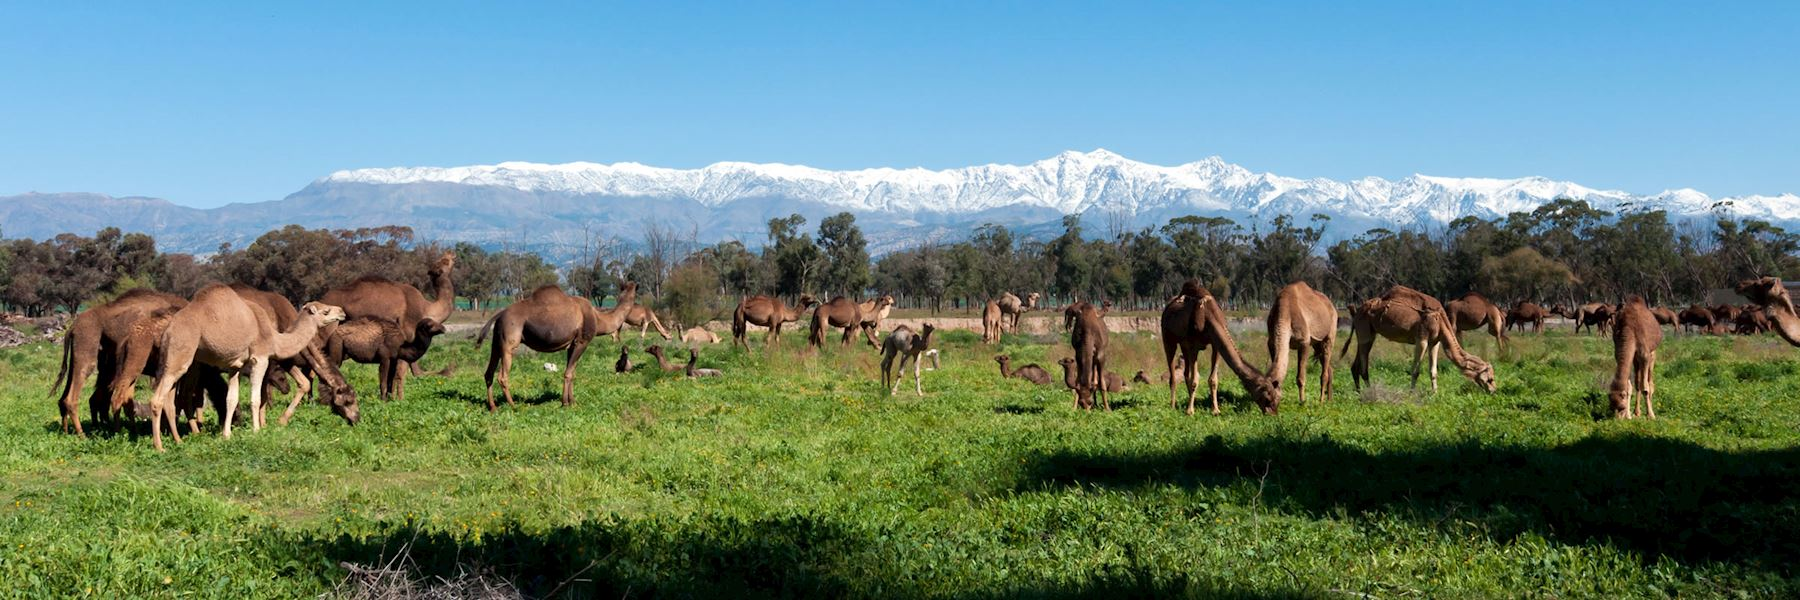 Visit Taroudant, Morocco